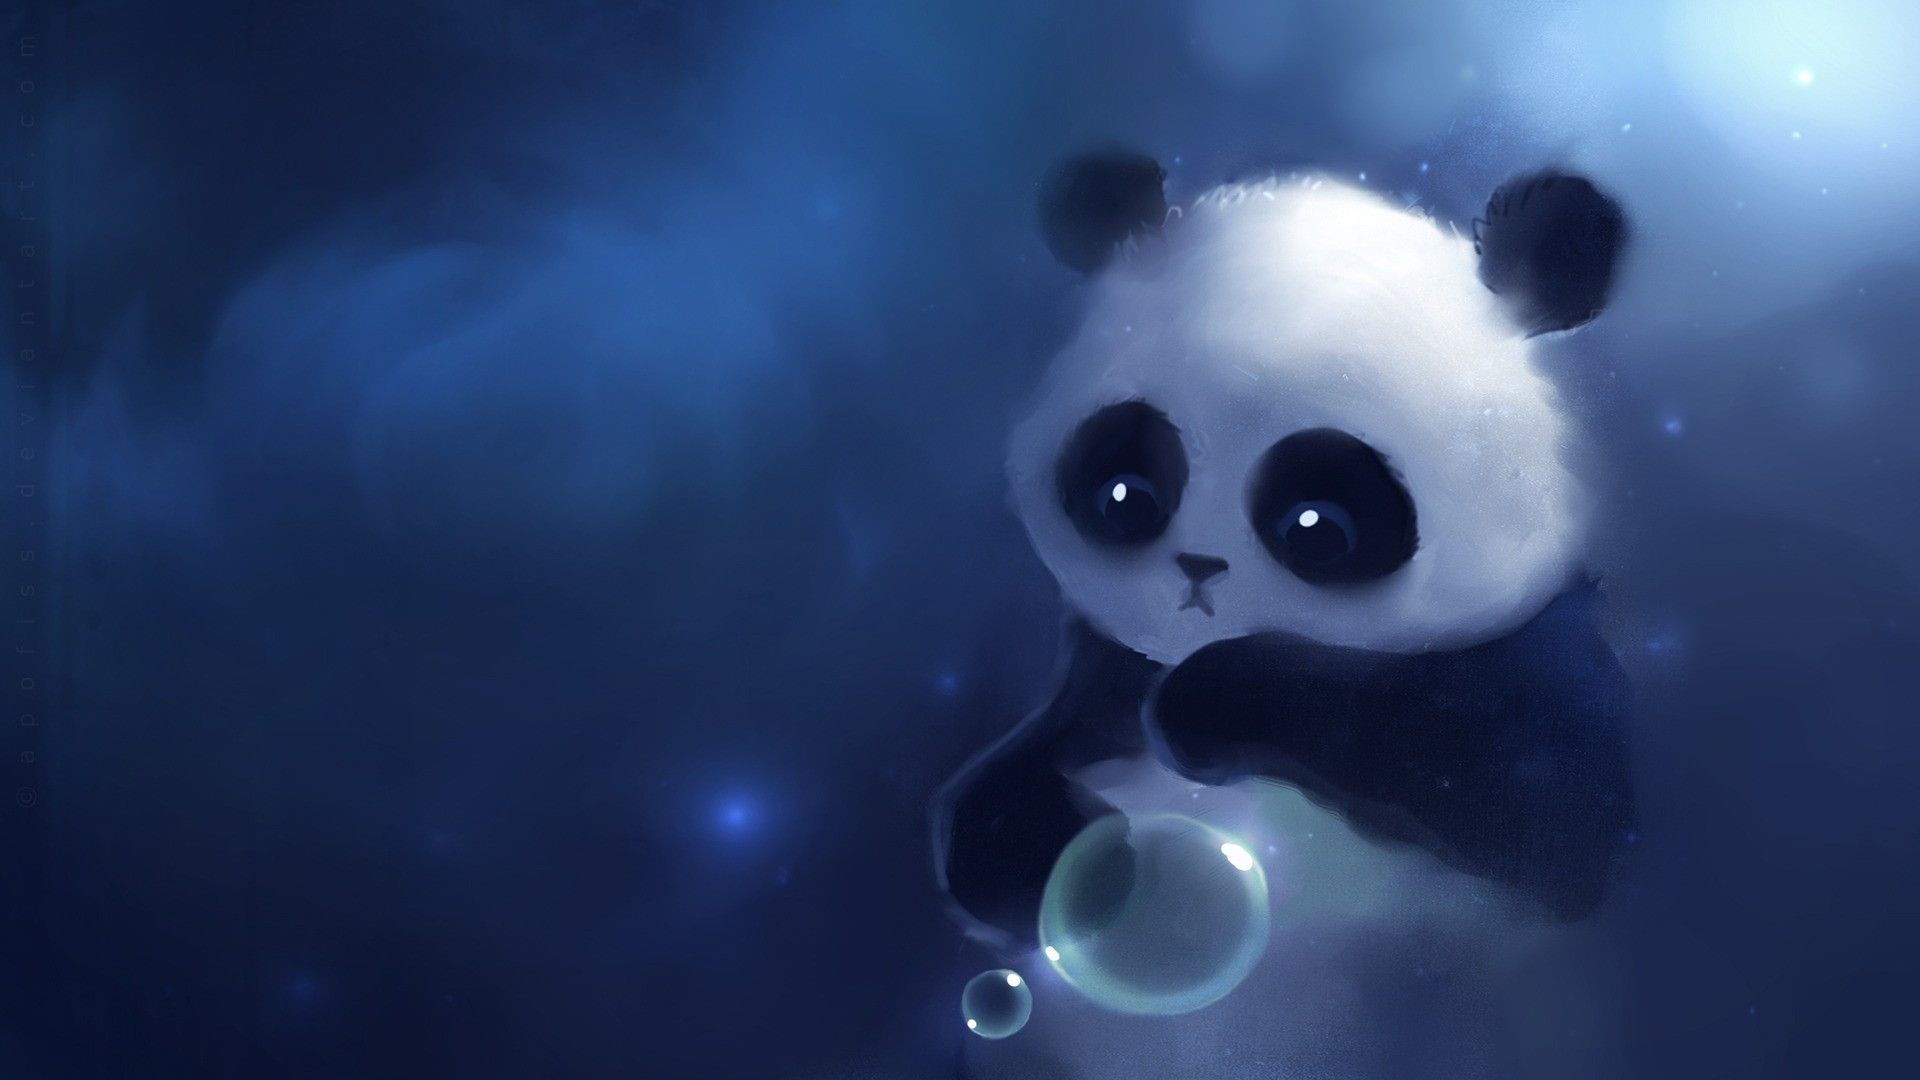 Animaux - Panda Fond d'écran | Art de panda, Fond d'ecran ...